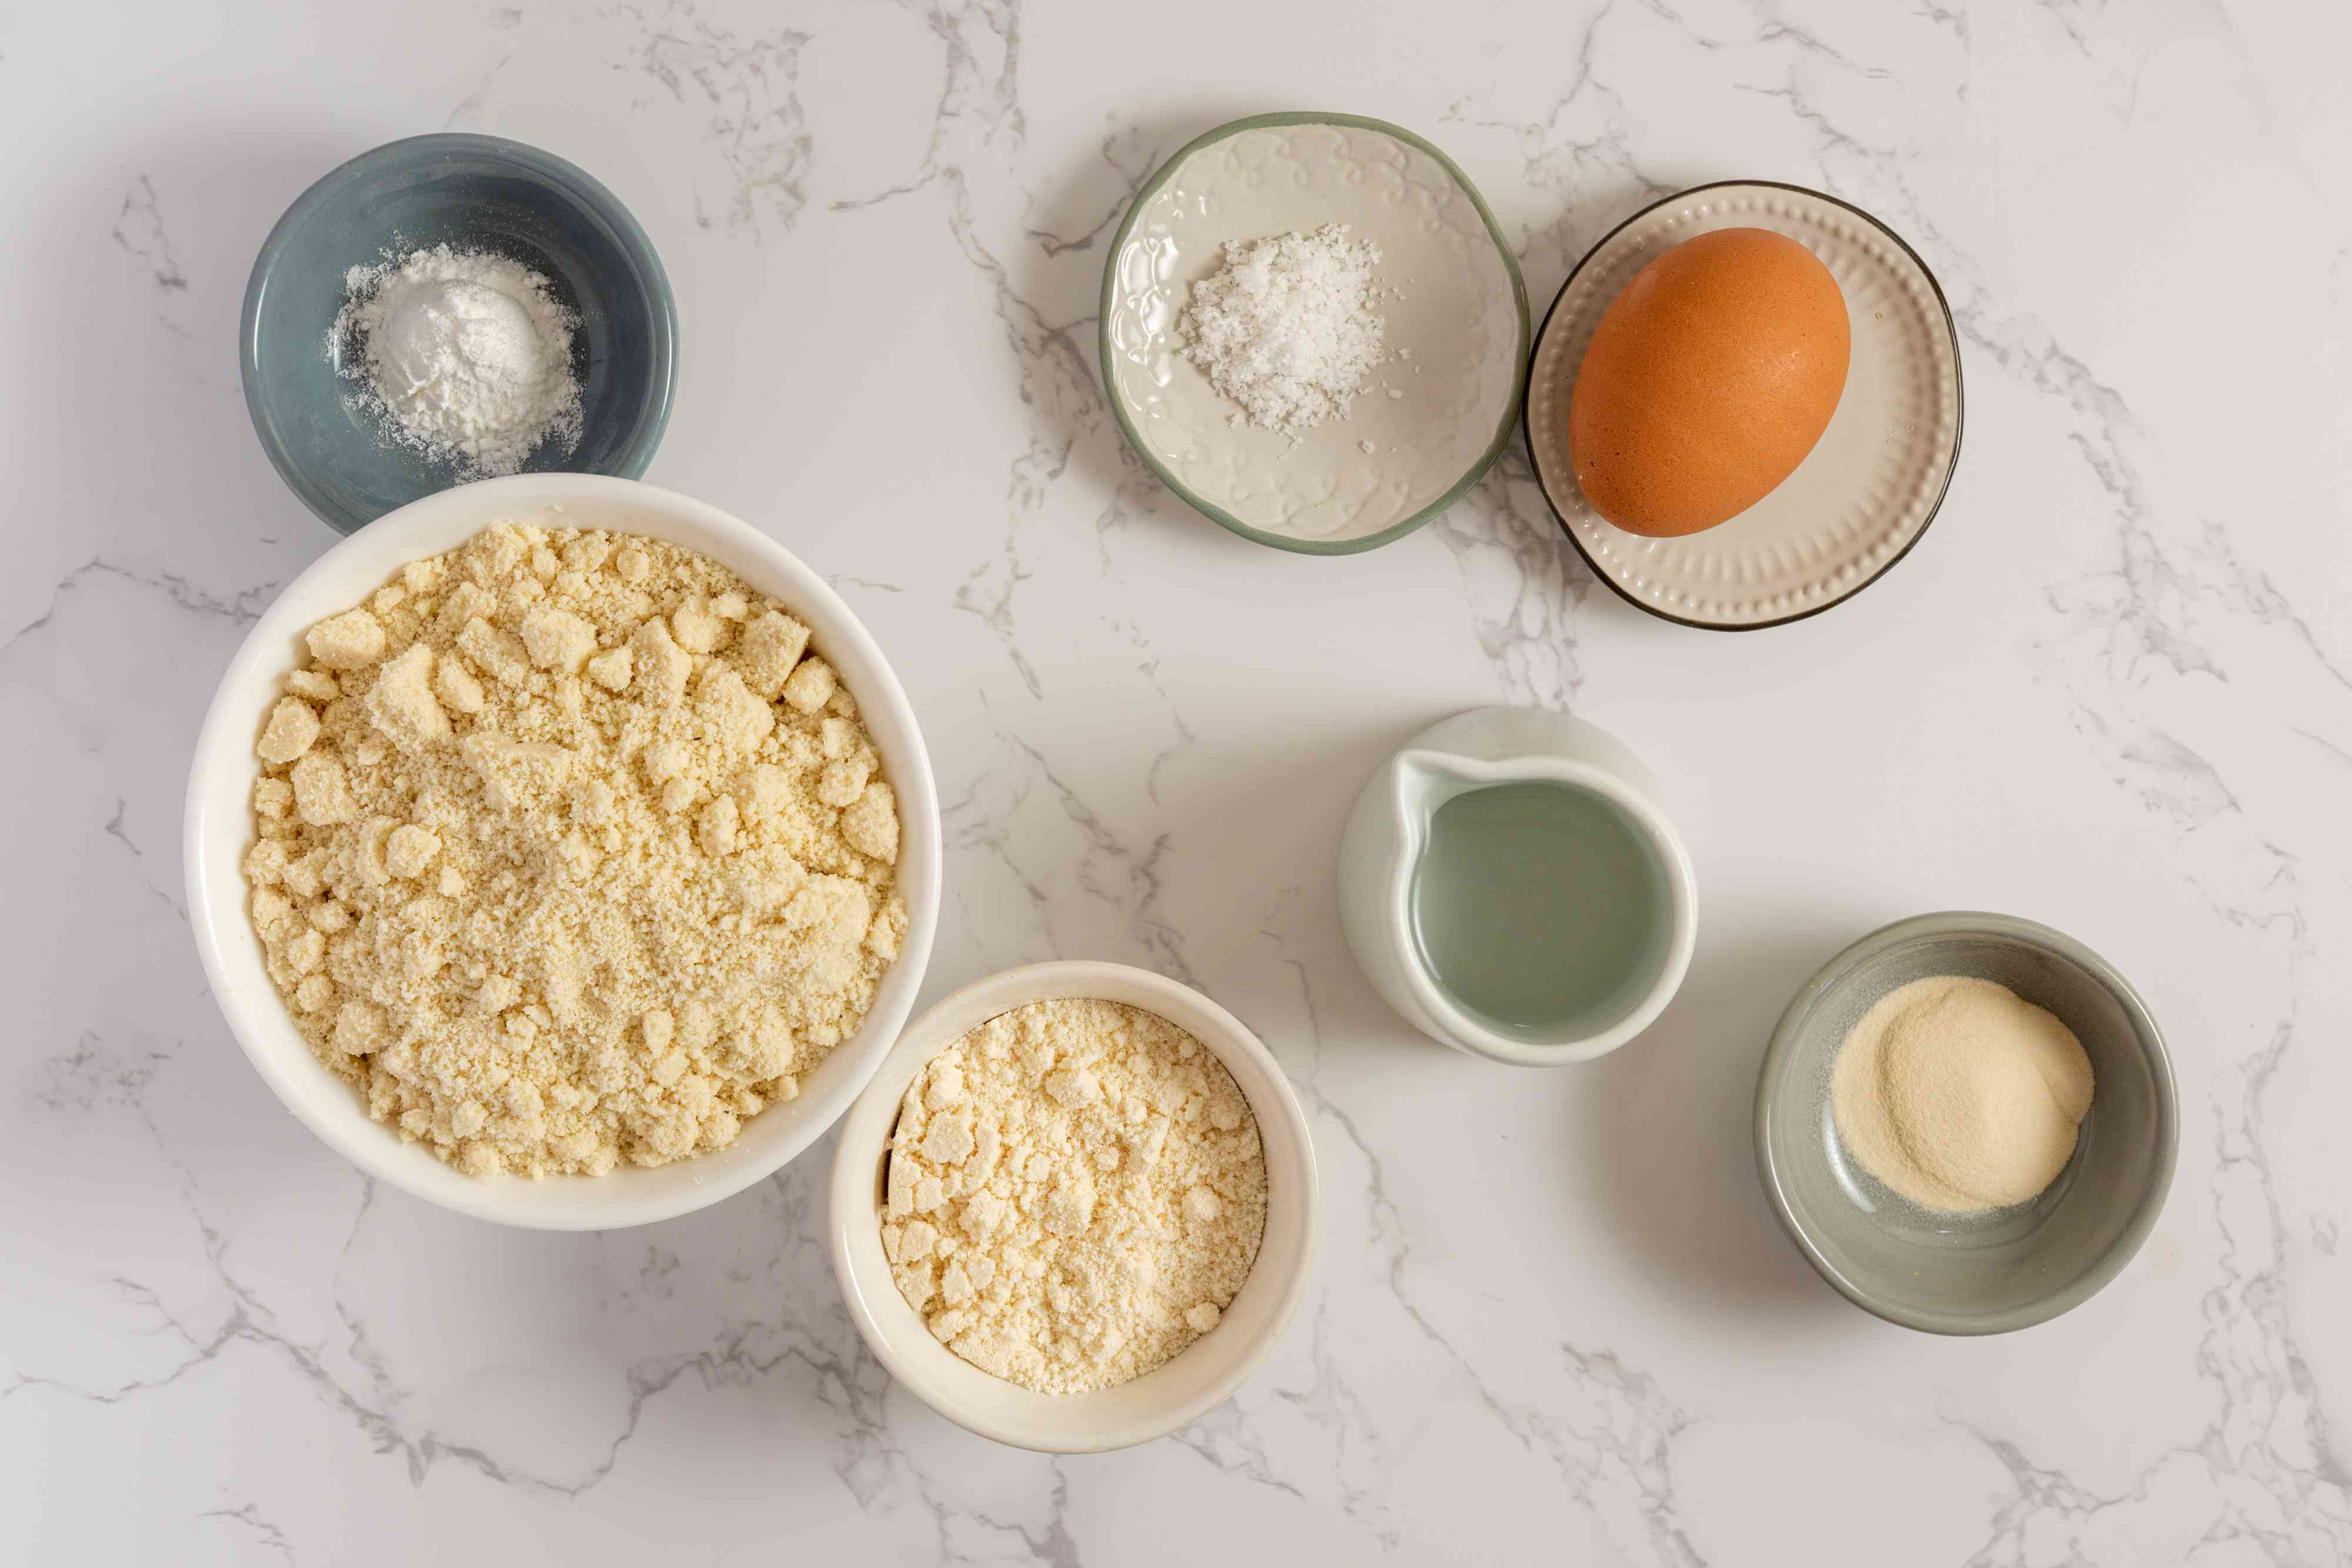 Keto Almond Flour Tortillas ingredients